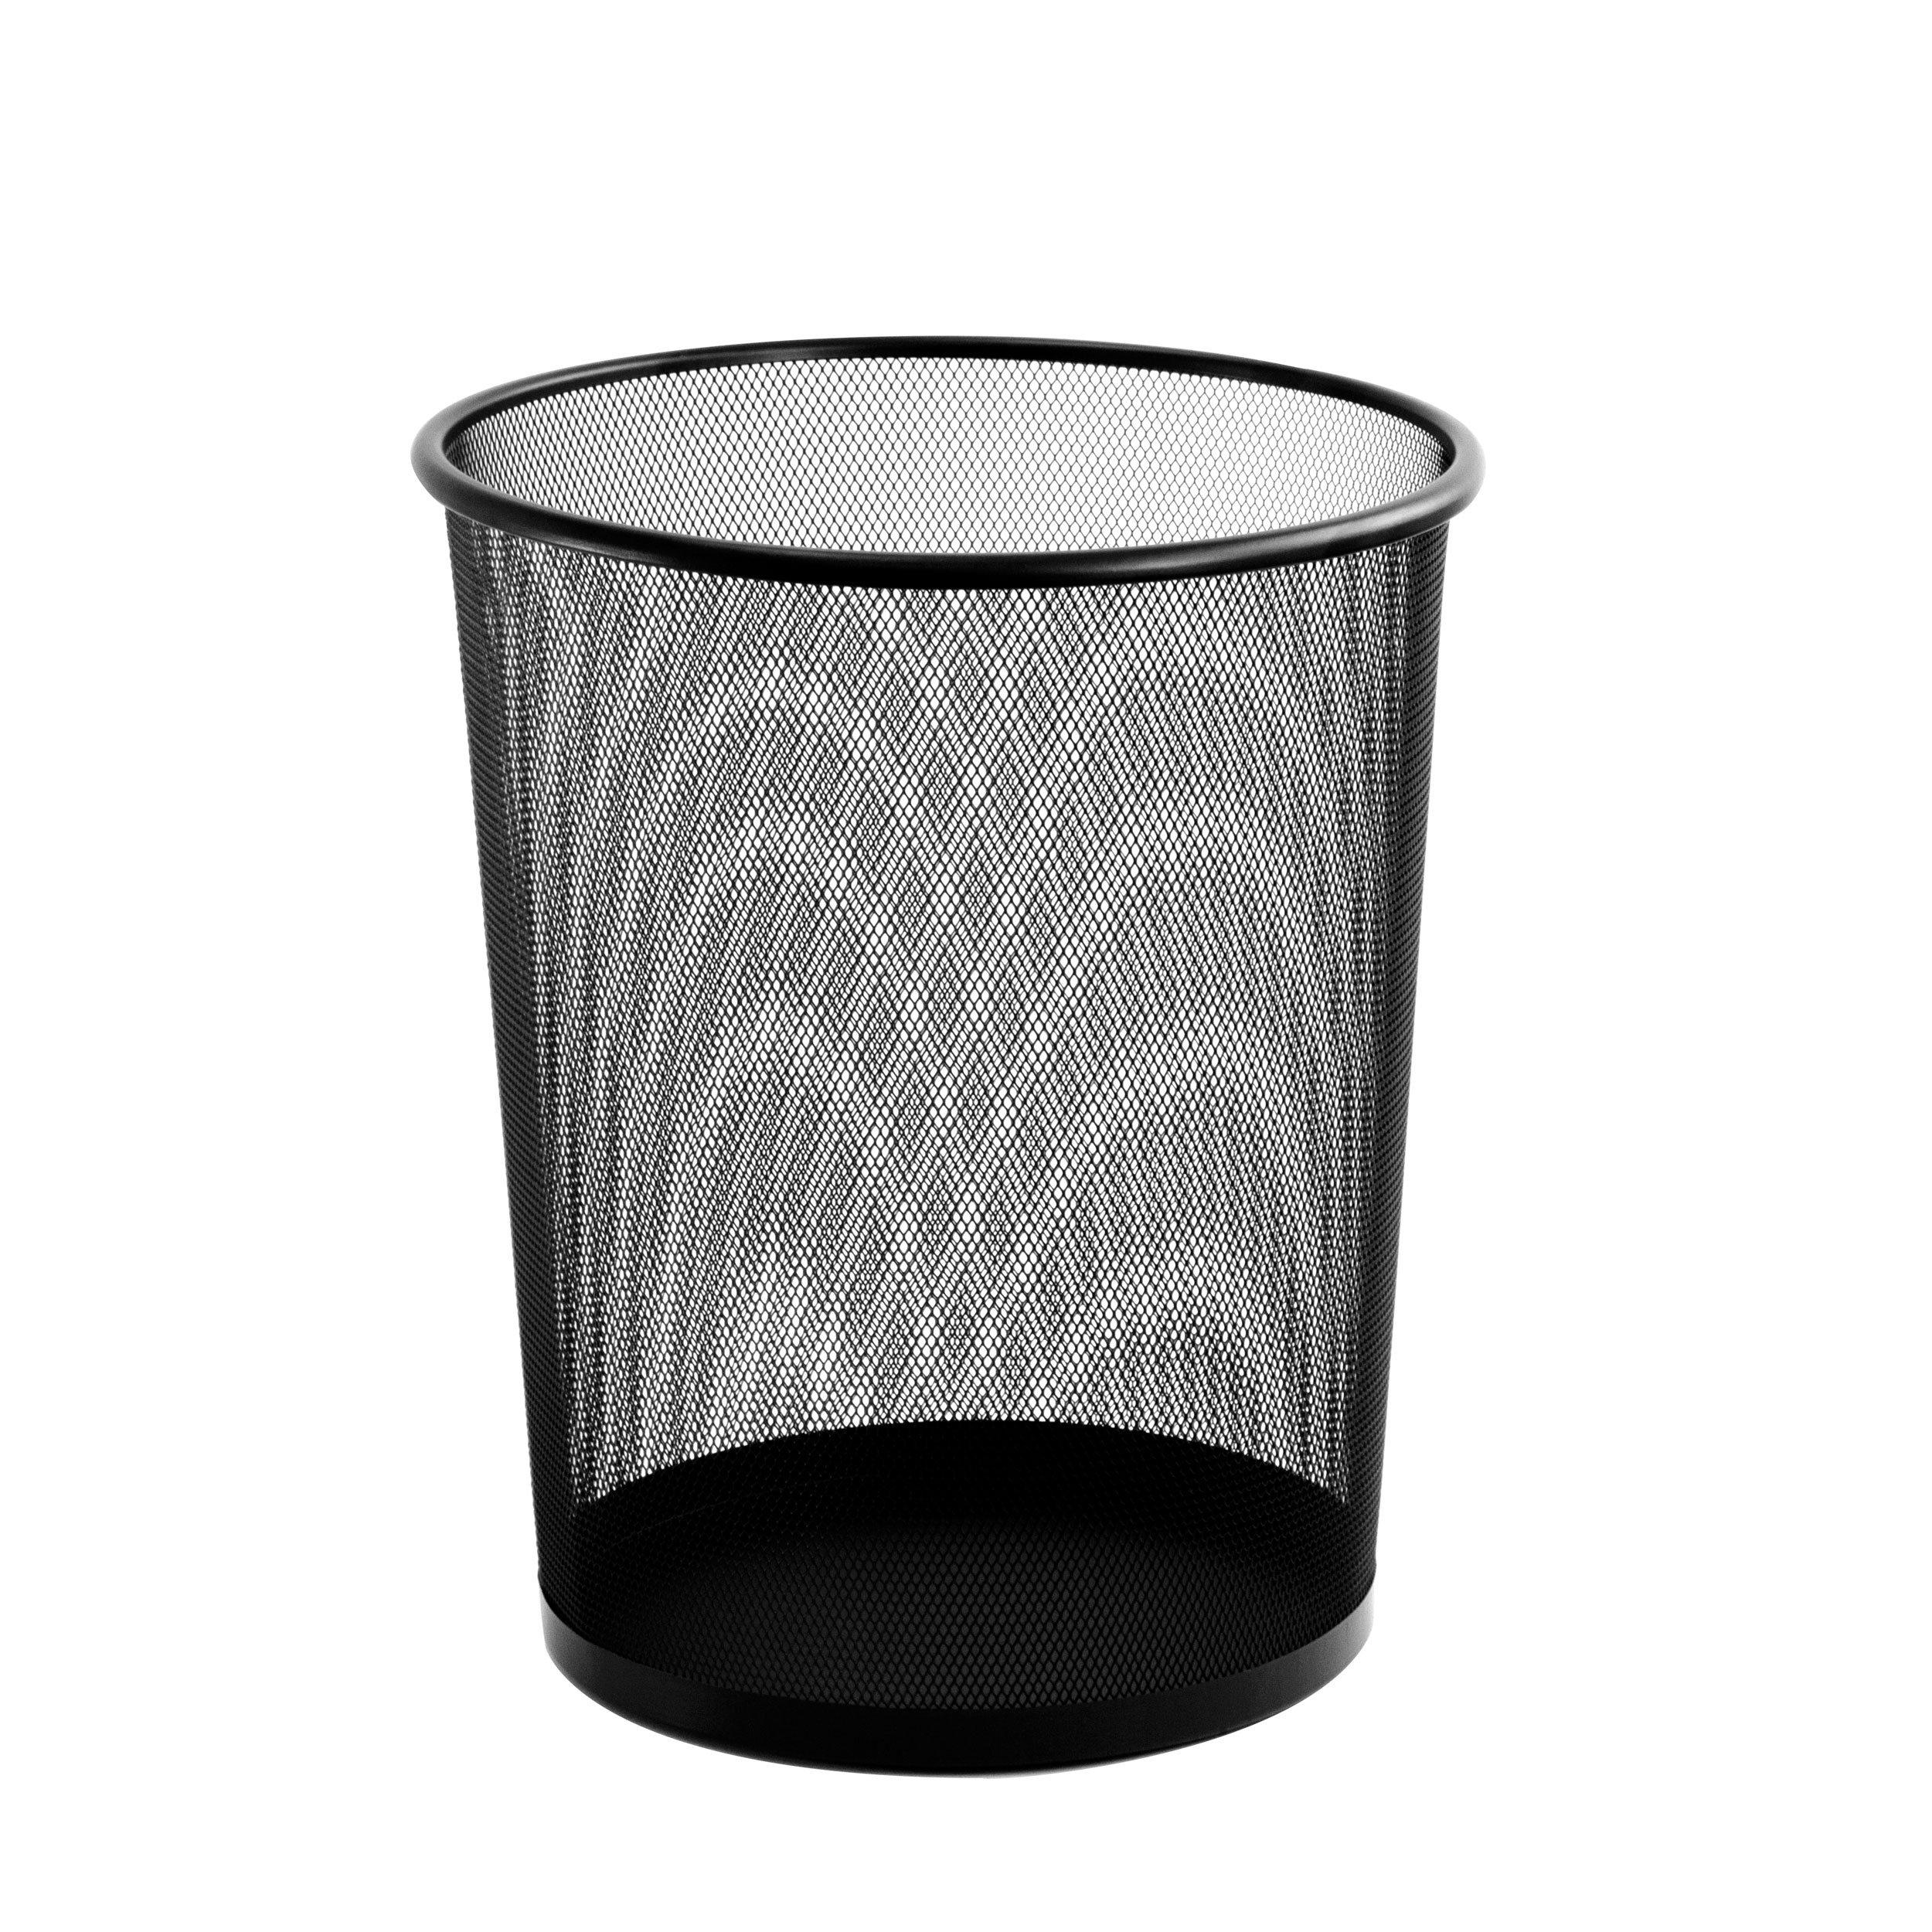 U Brands Mesh Steel Trash Can, 14'' Height x 12'' Diameter, 6 Gallon Capacity, Black